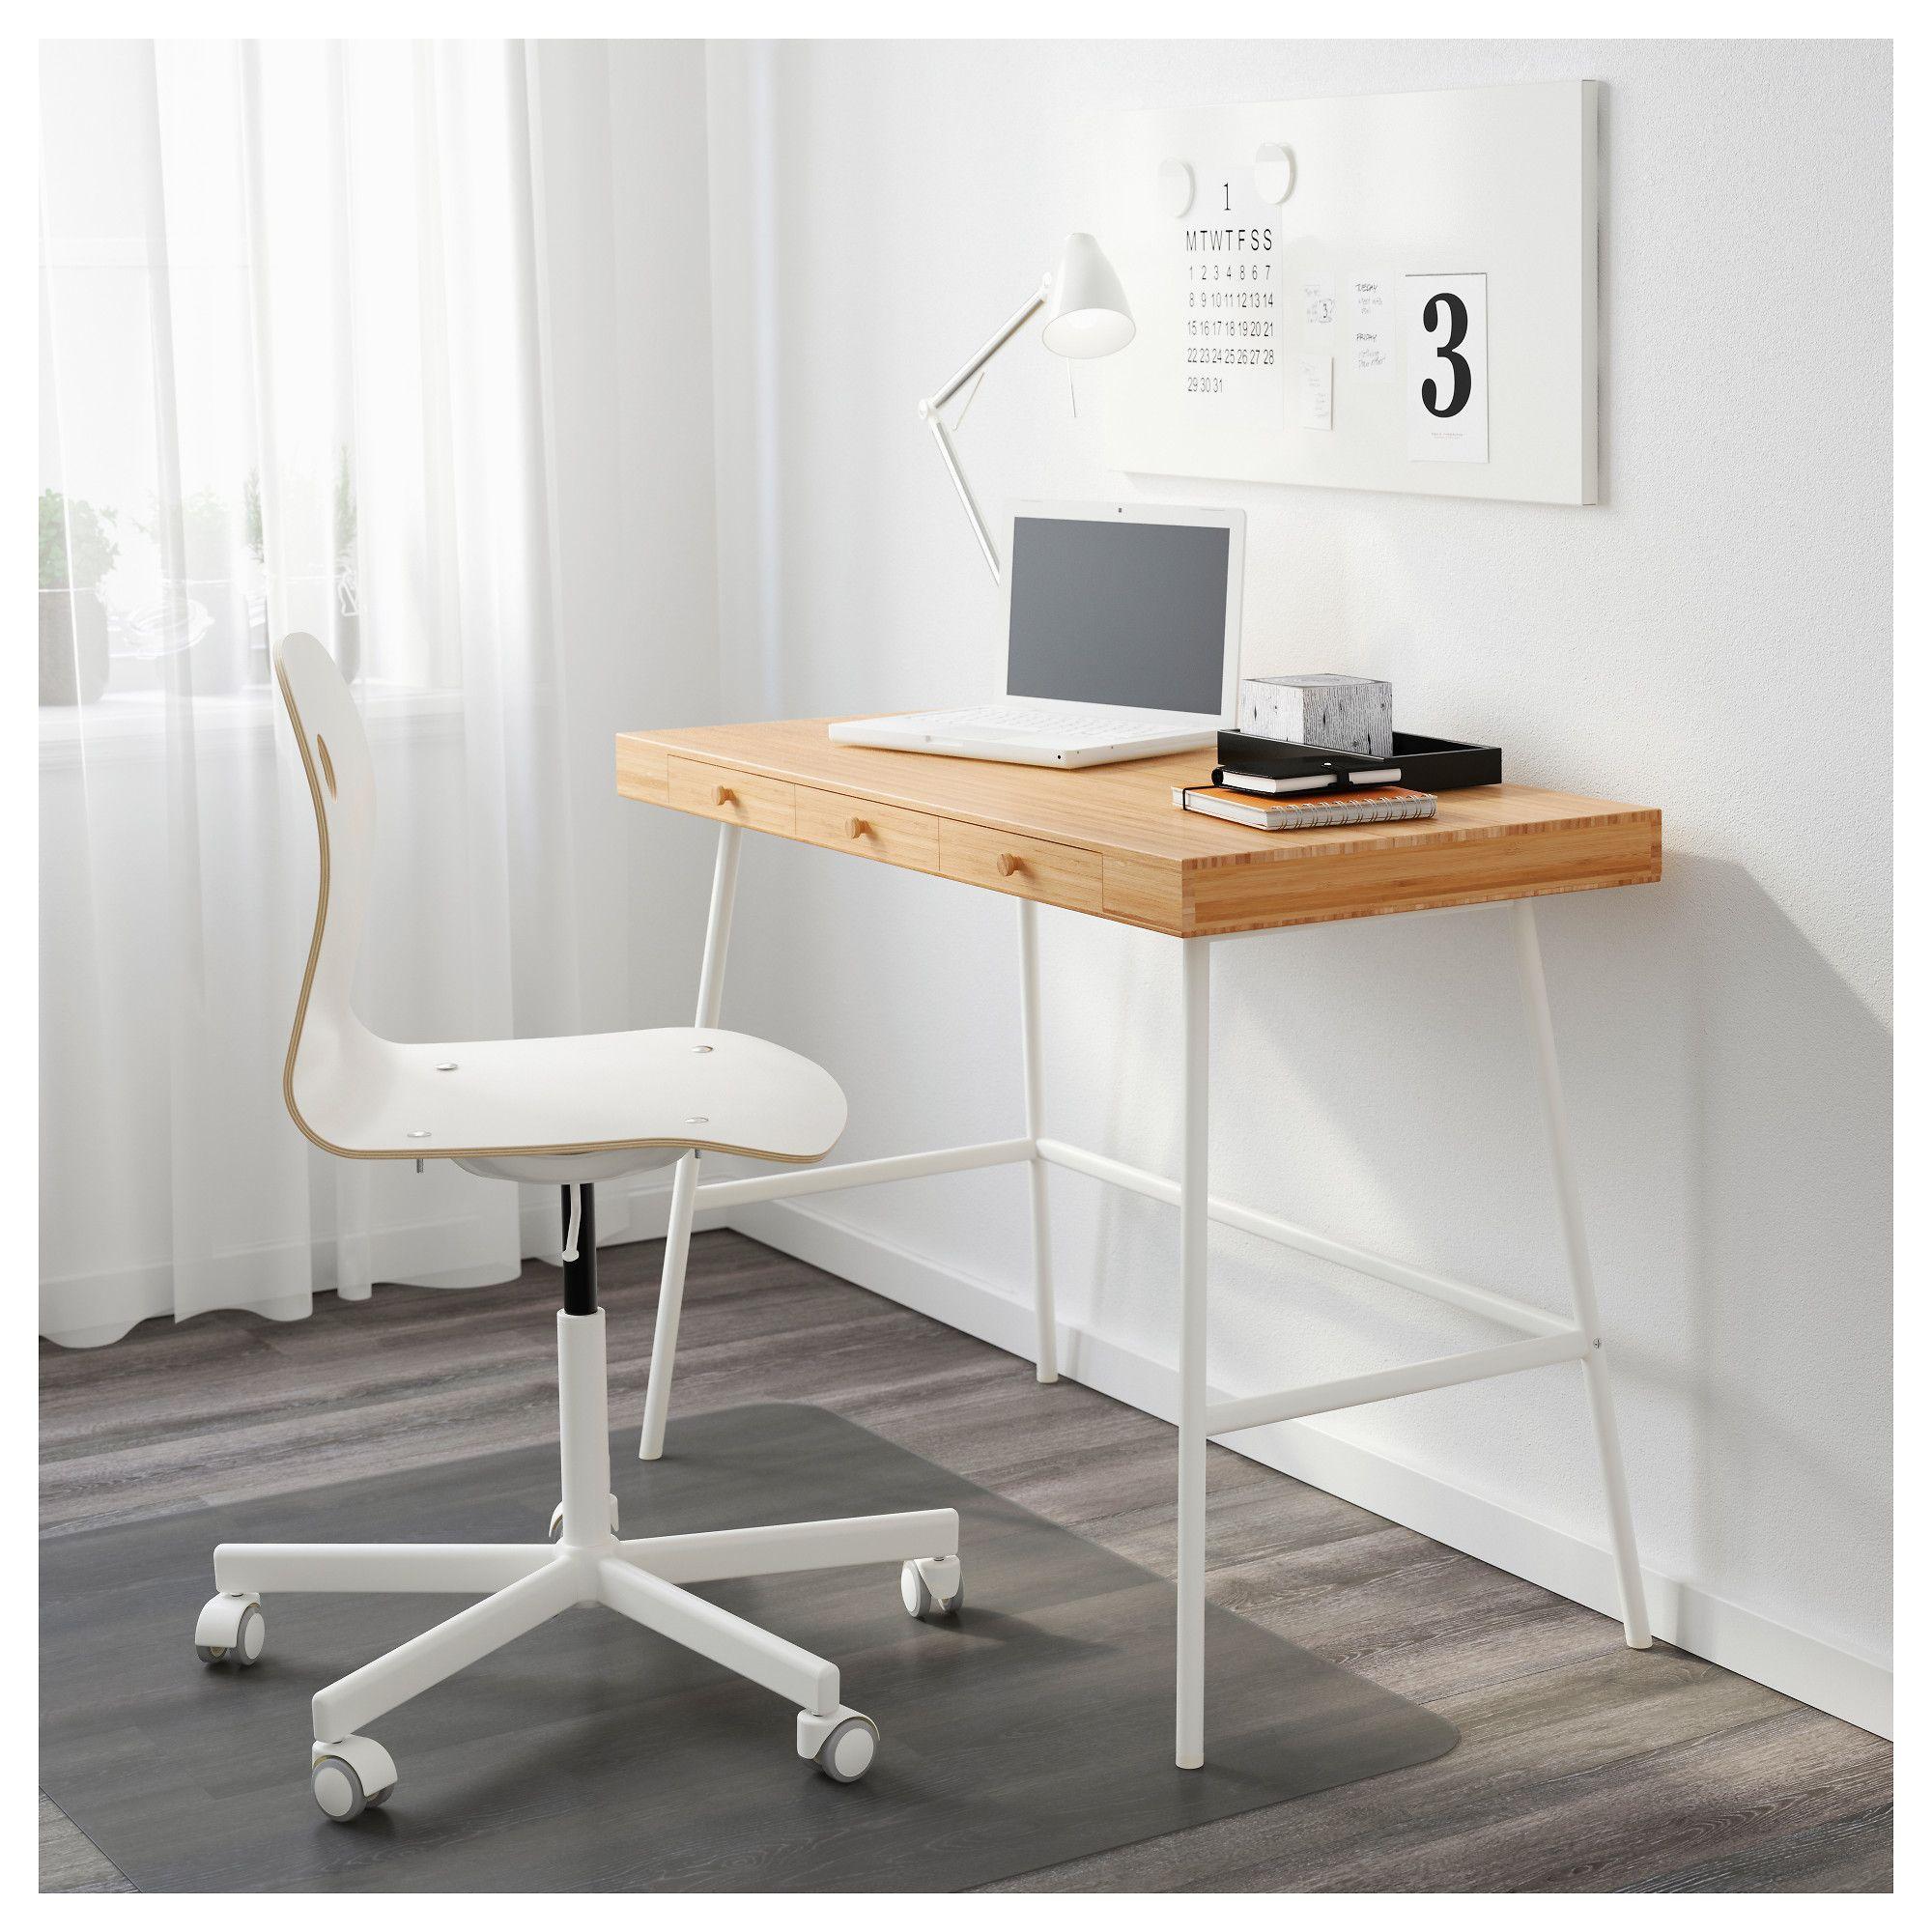 Lillasen Desk Bamboo 40 1 8x19 1 4 Ikea Desk Ikea Furniture